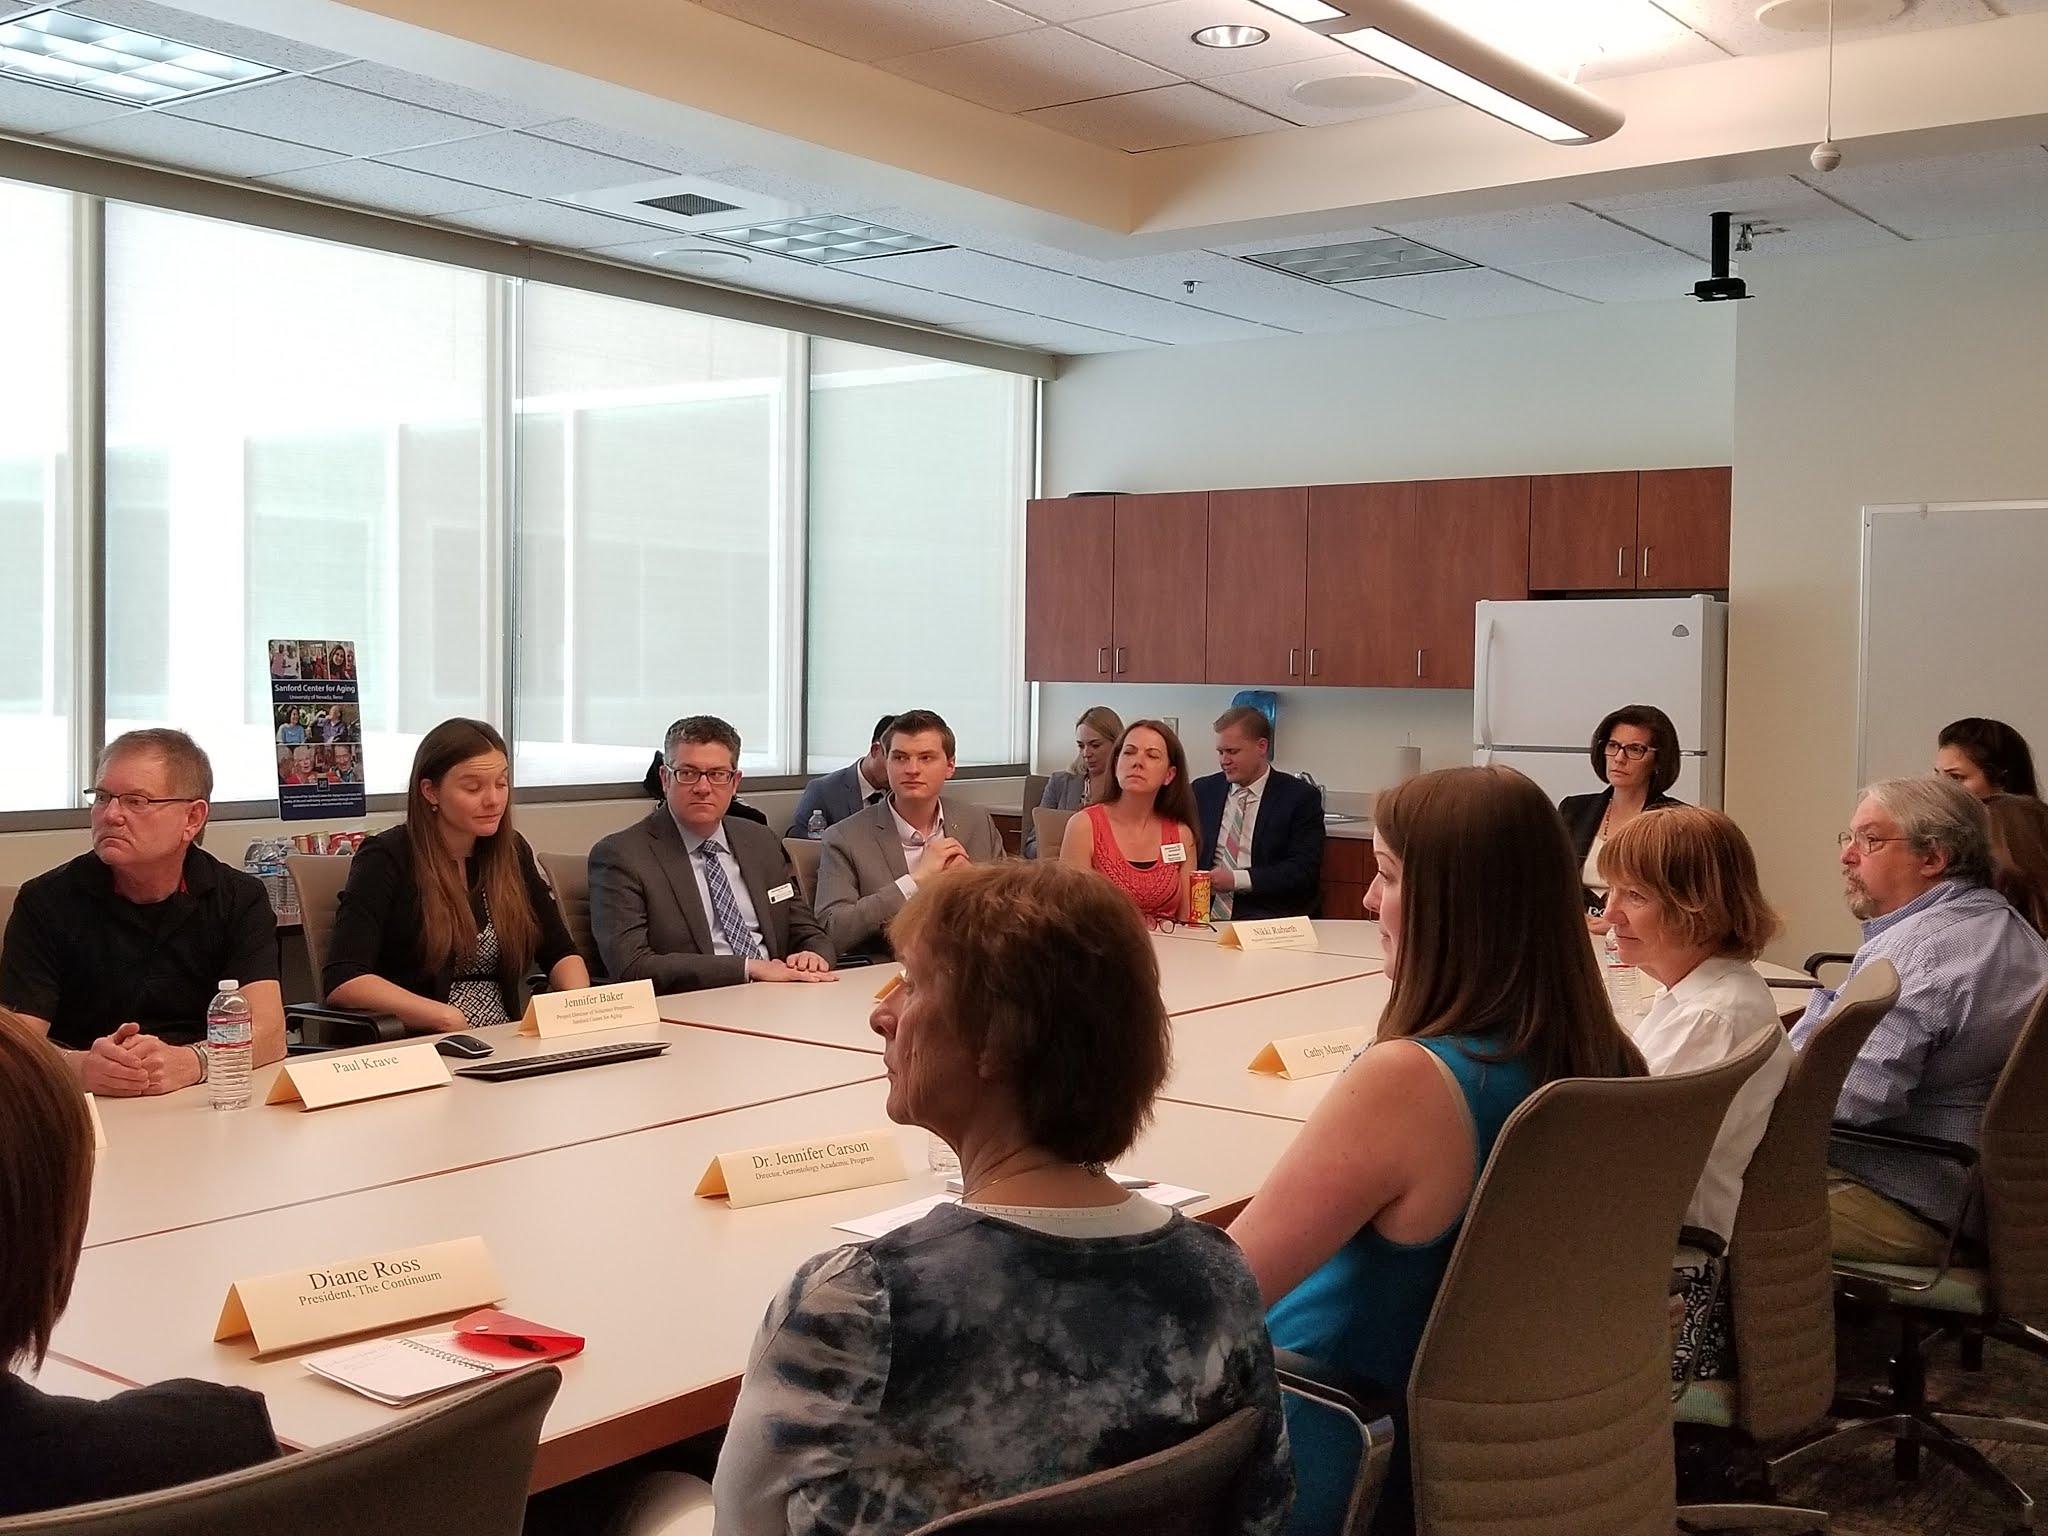 Cortez Masto meets with Alzheimer's advocates